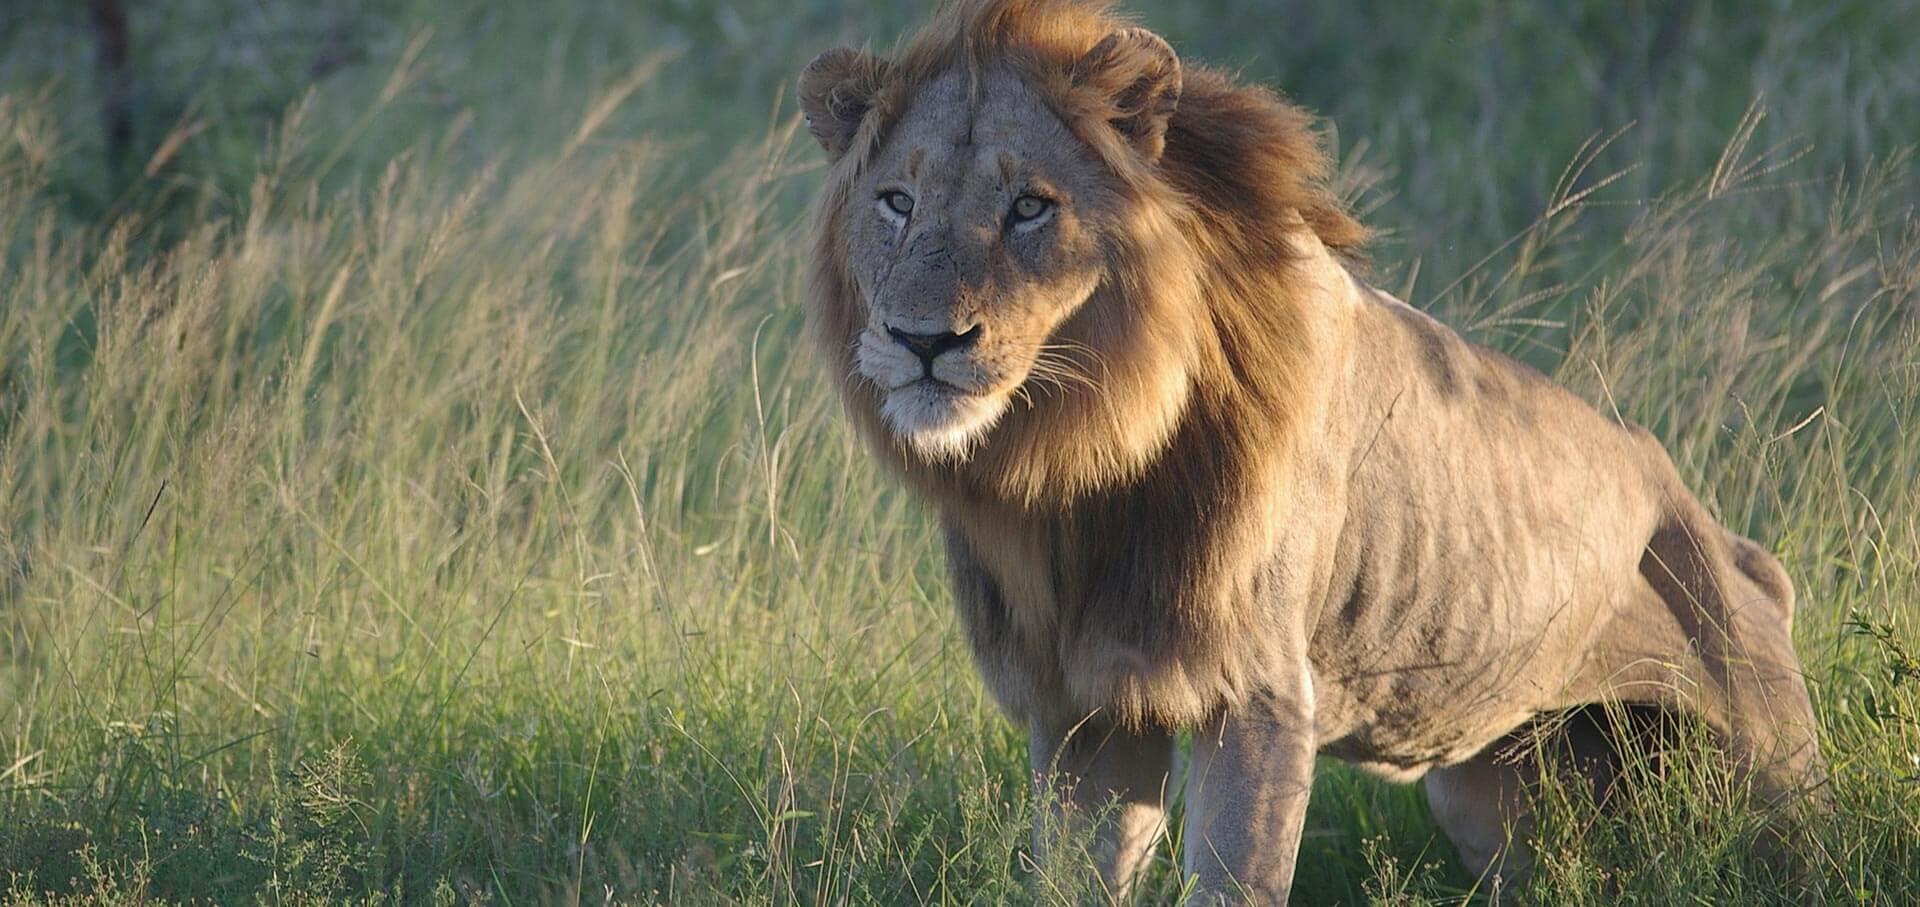 The Lion S Share 12 Days Luxury African Safari